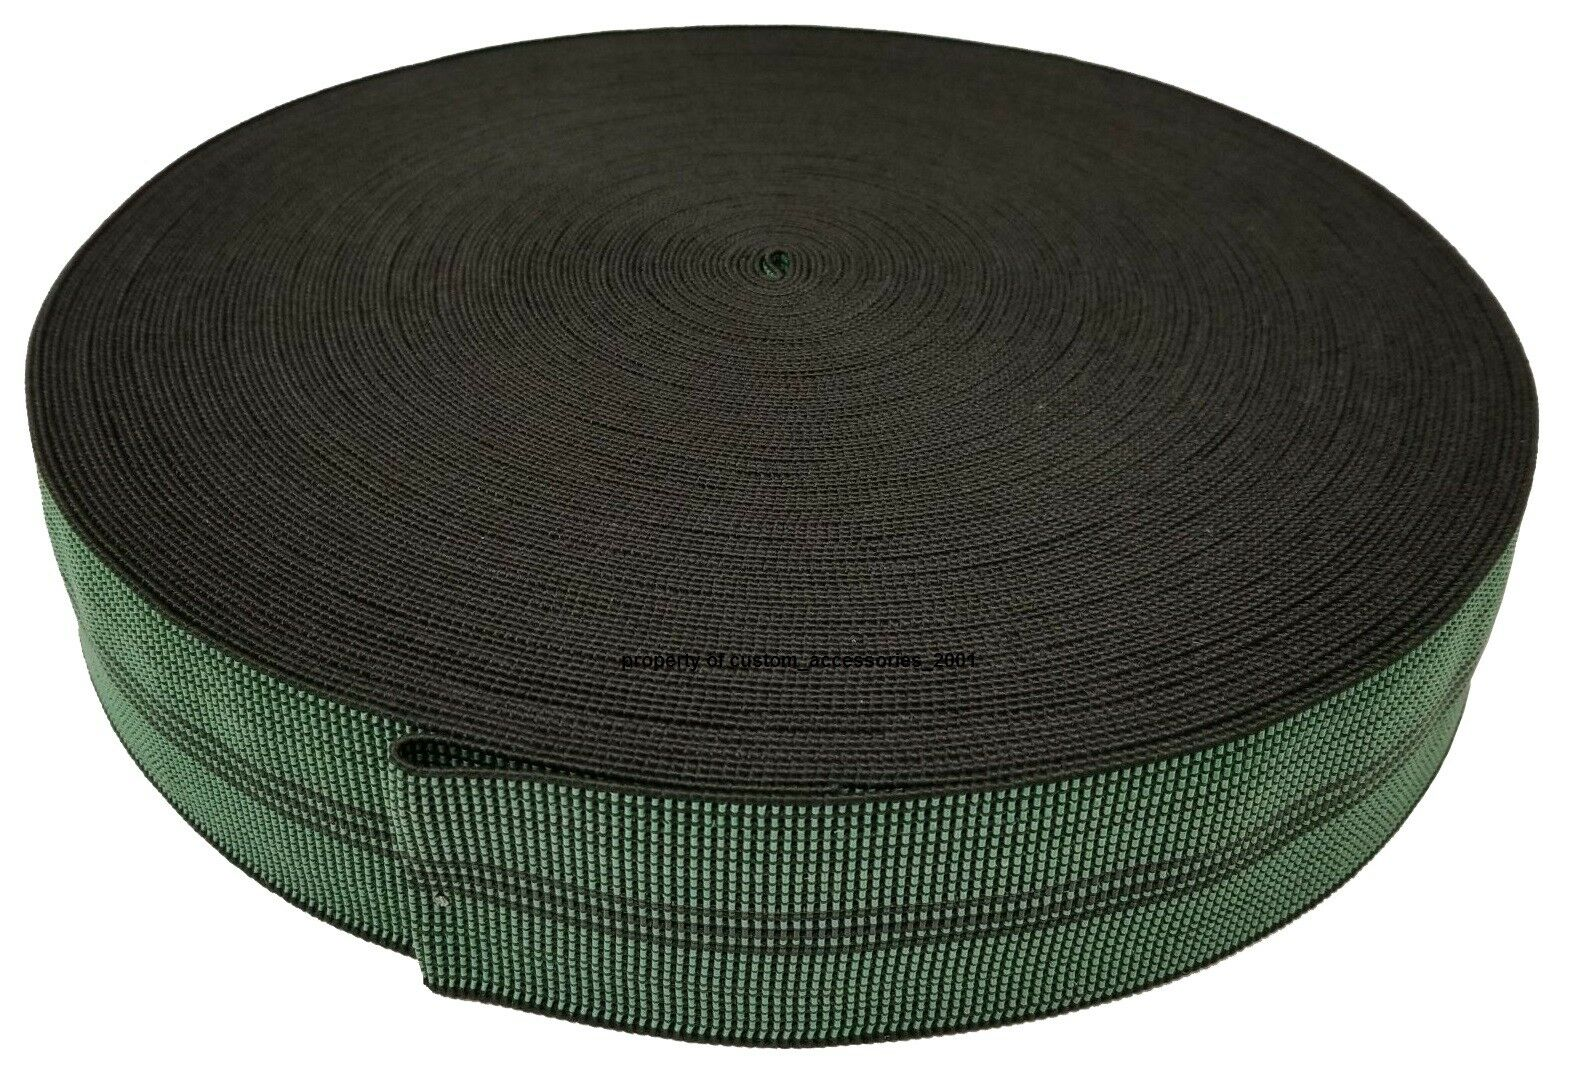 2″ Elastic Furniture Webbing Upholstery 65% Stretch [Black/Green] 164′ Roll Home & Garden